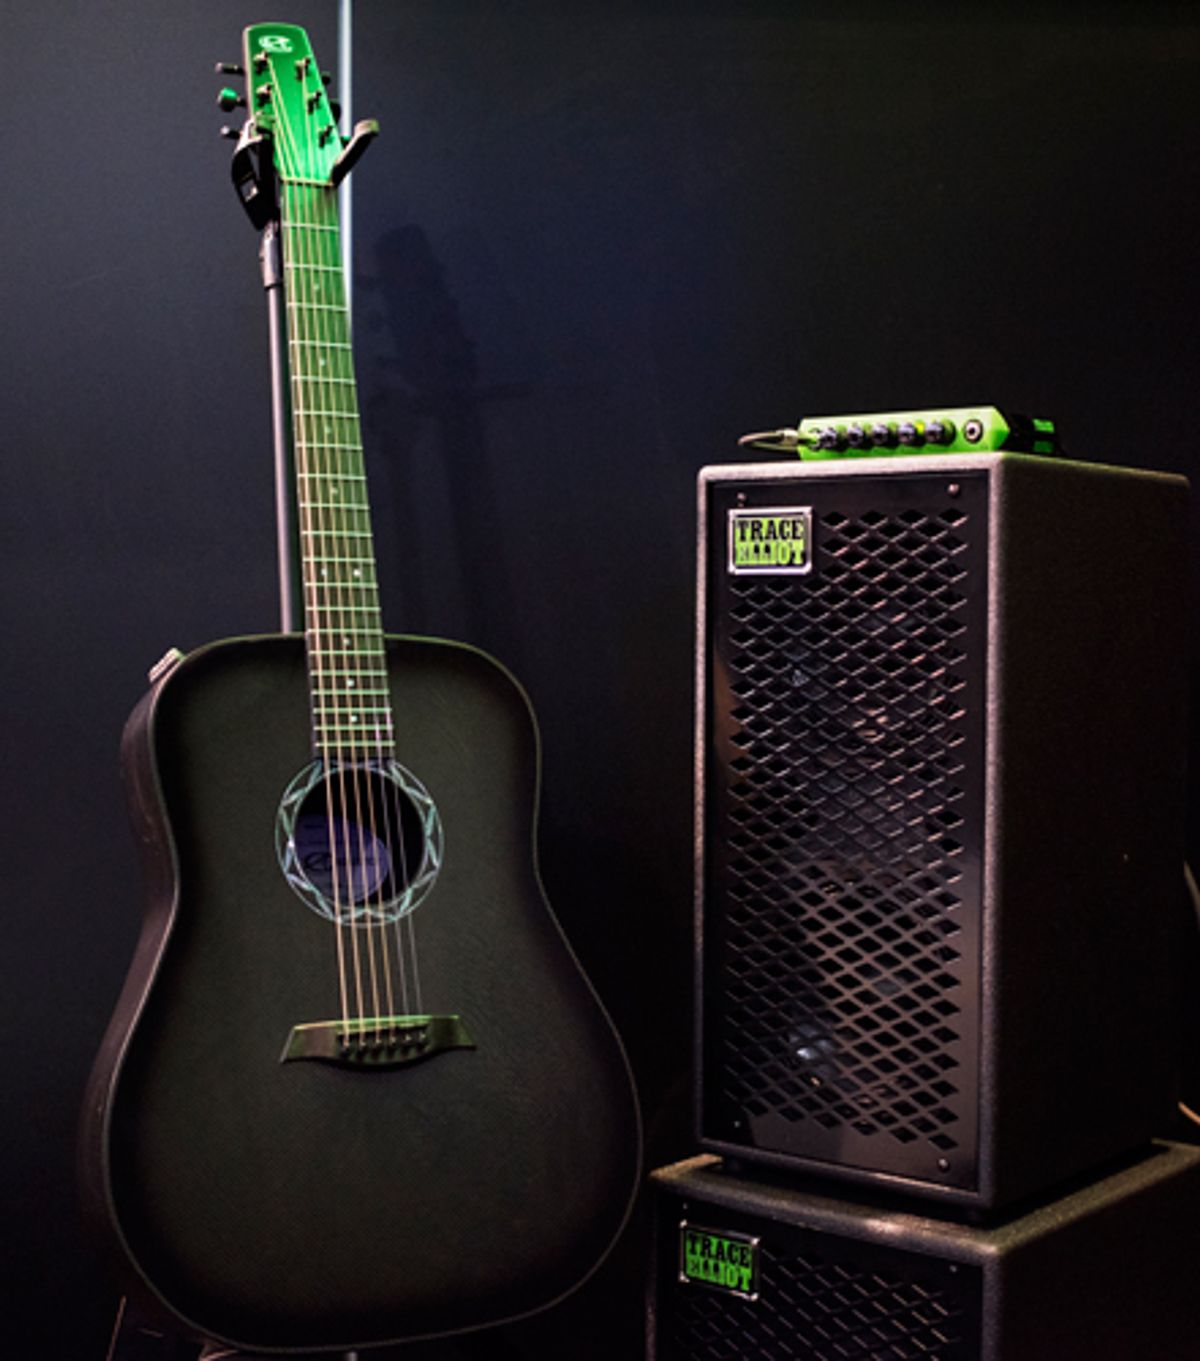 Composite Acoustics Teams with Trace Elliot